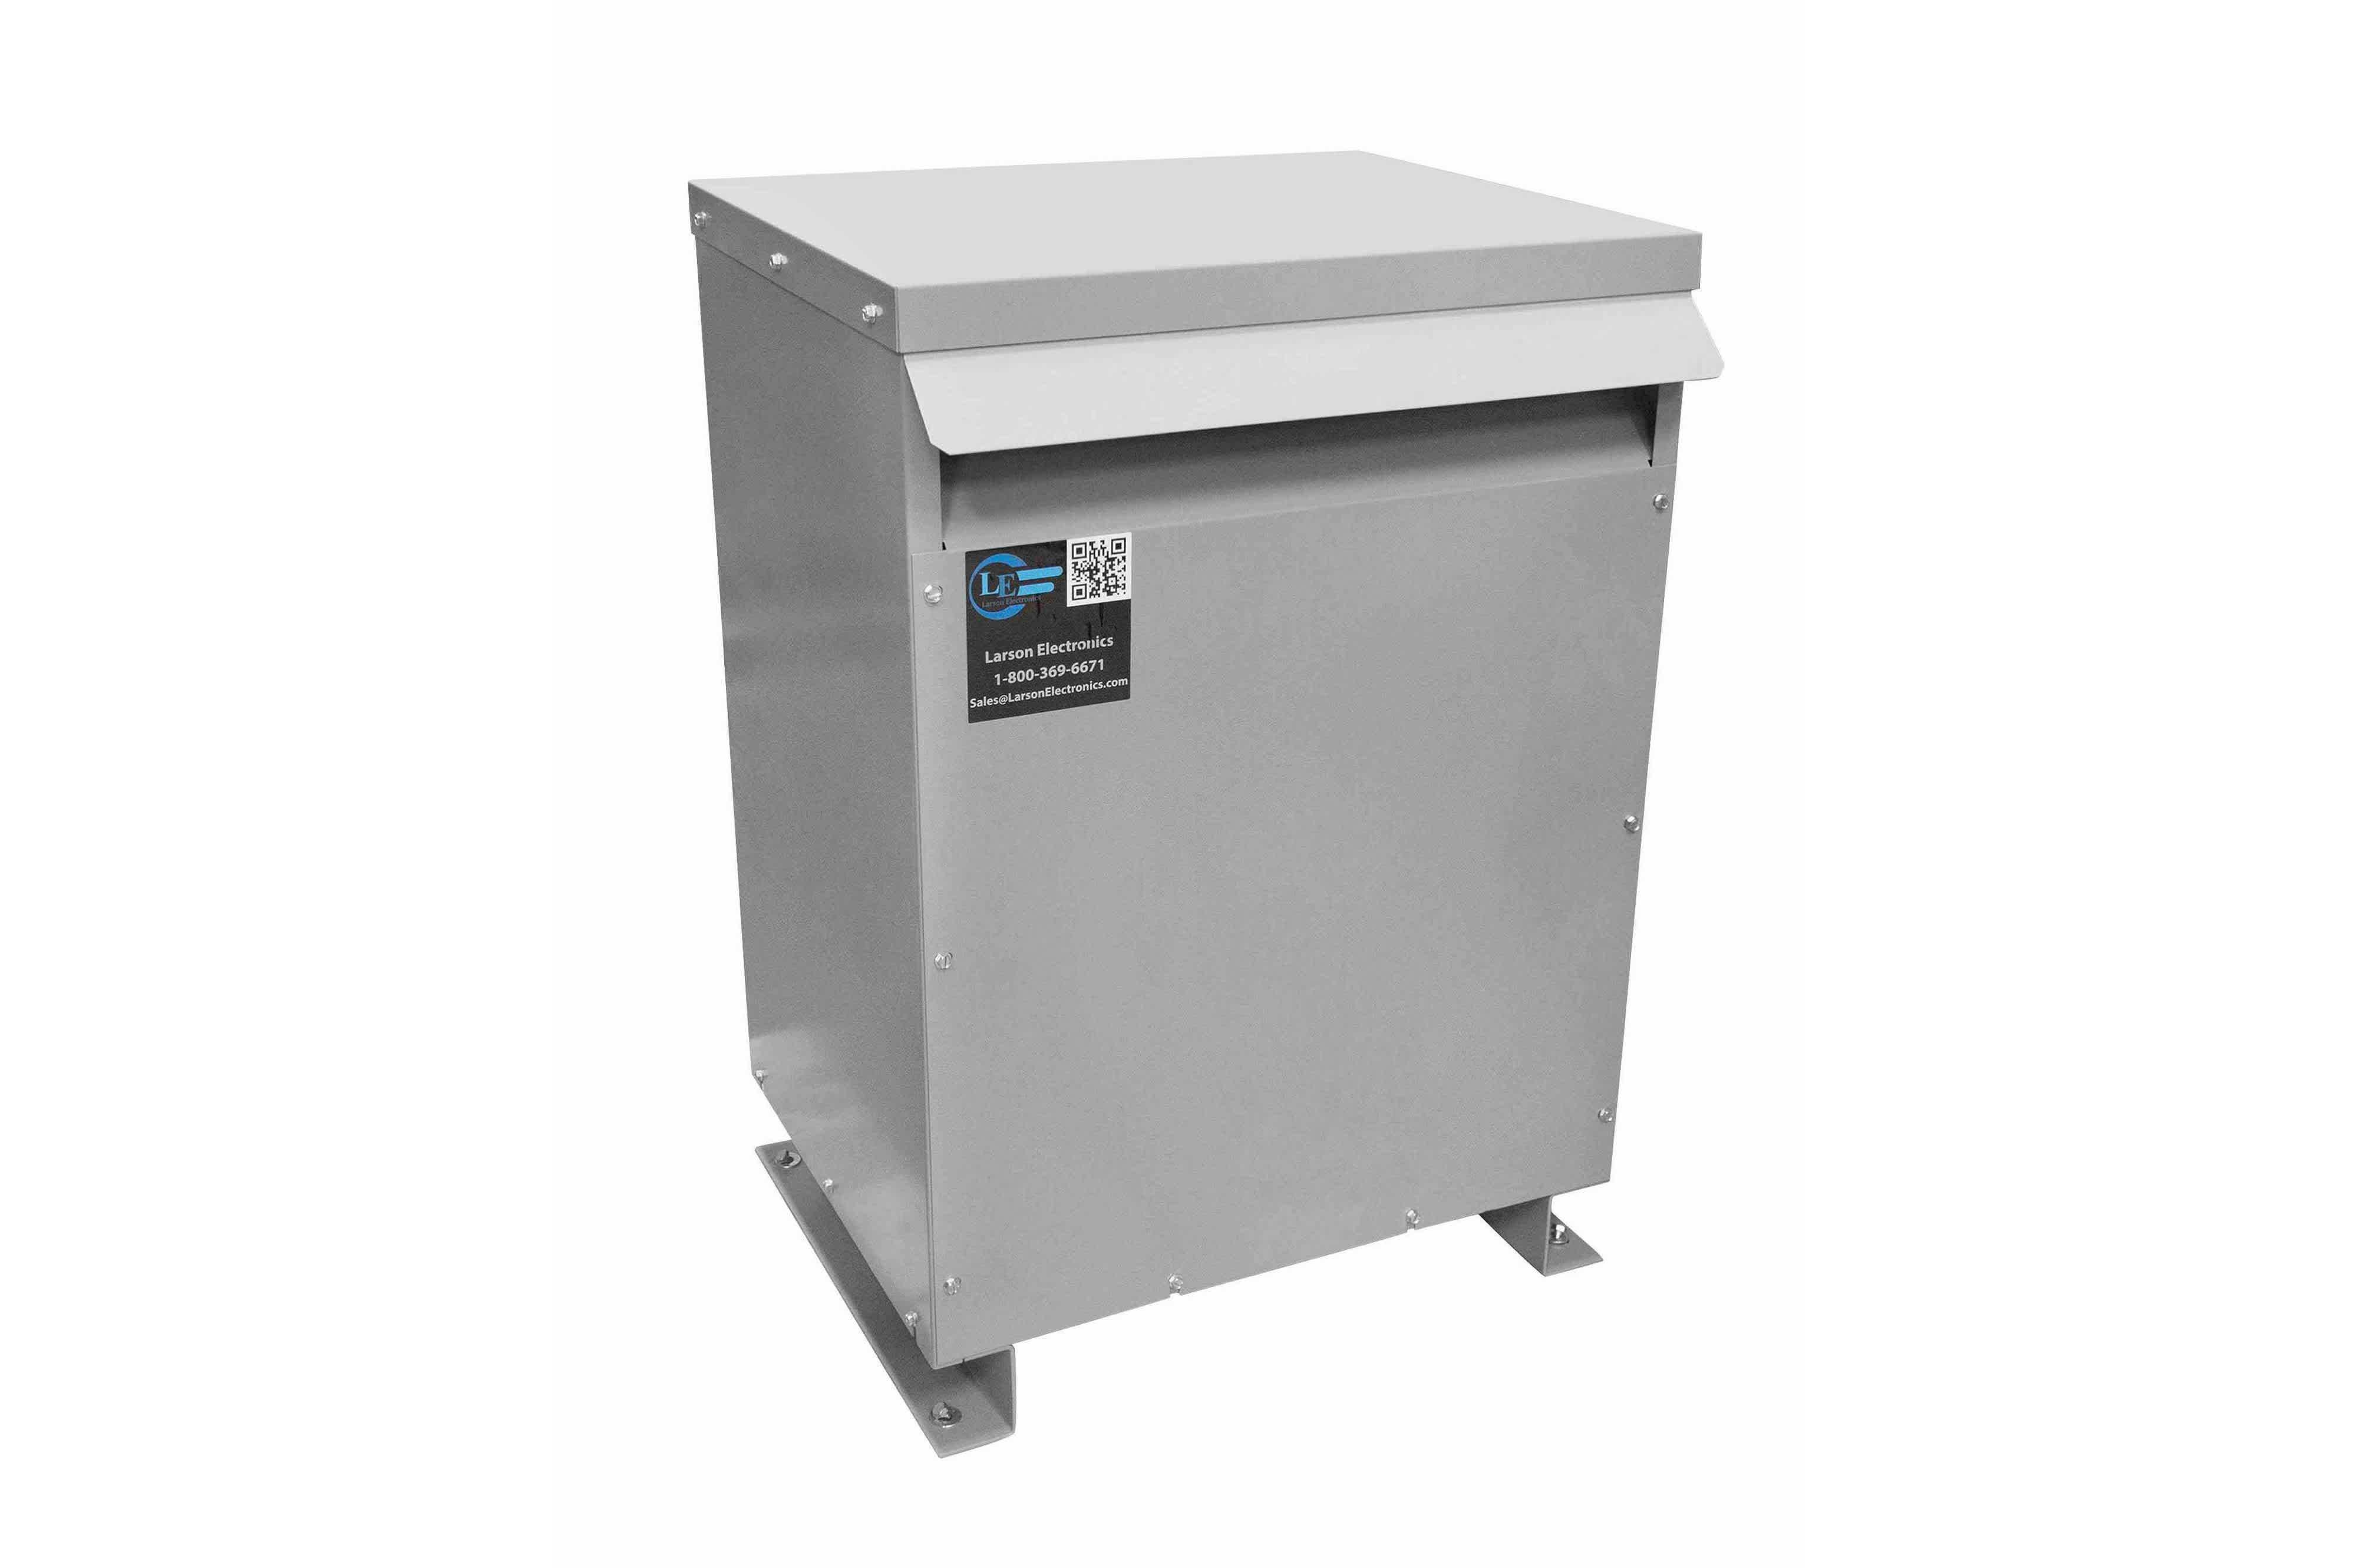 275 kVA 3PH Isolation Transformer, 400V Wye Primary, 240V Delta Secondary, N3R, Ventilated, 60 Hz